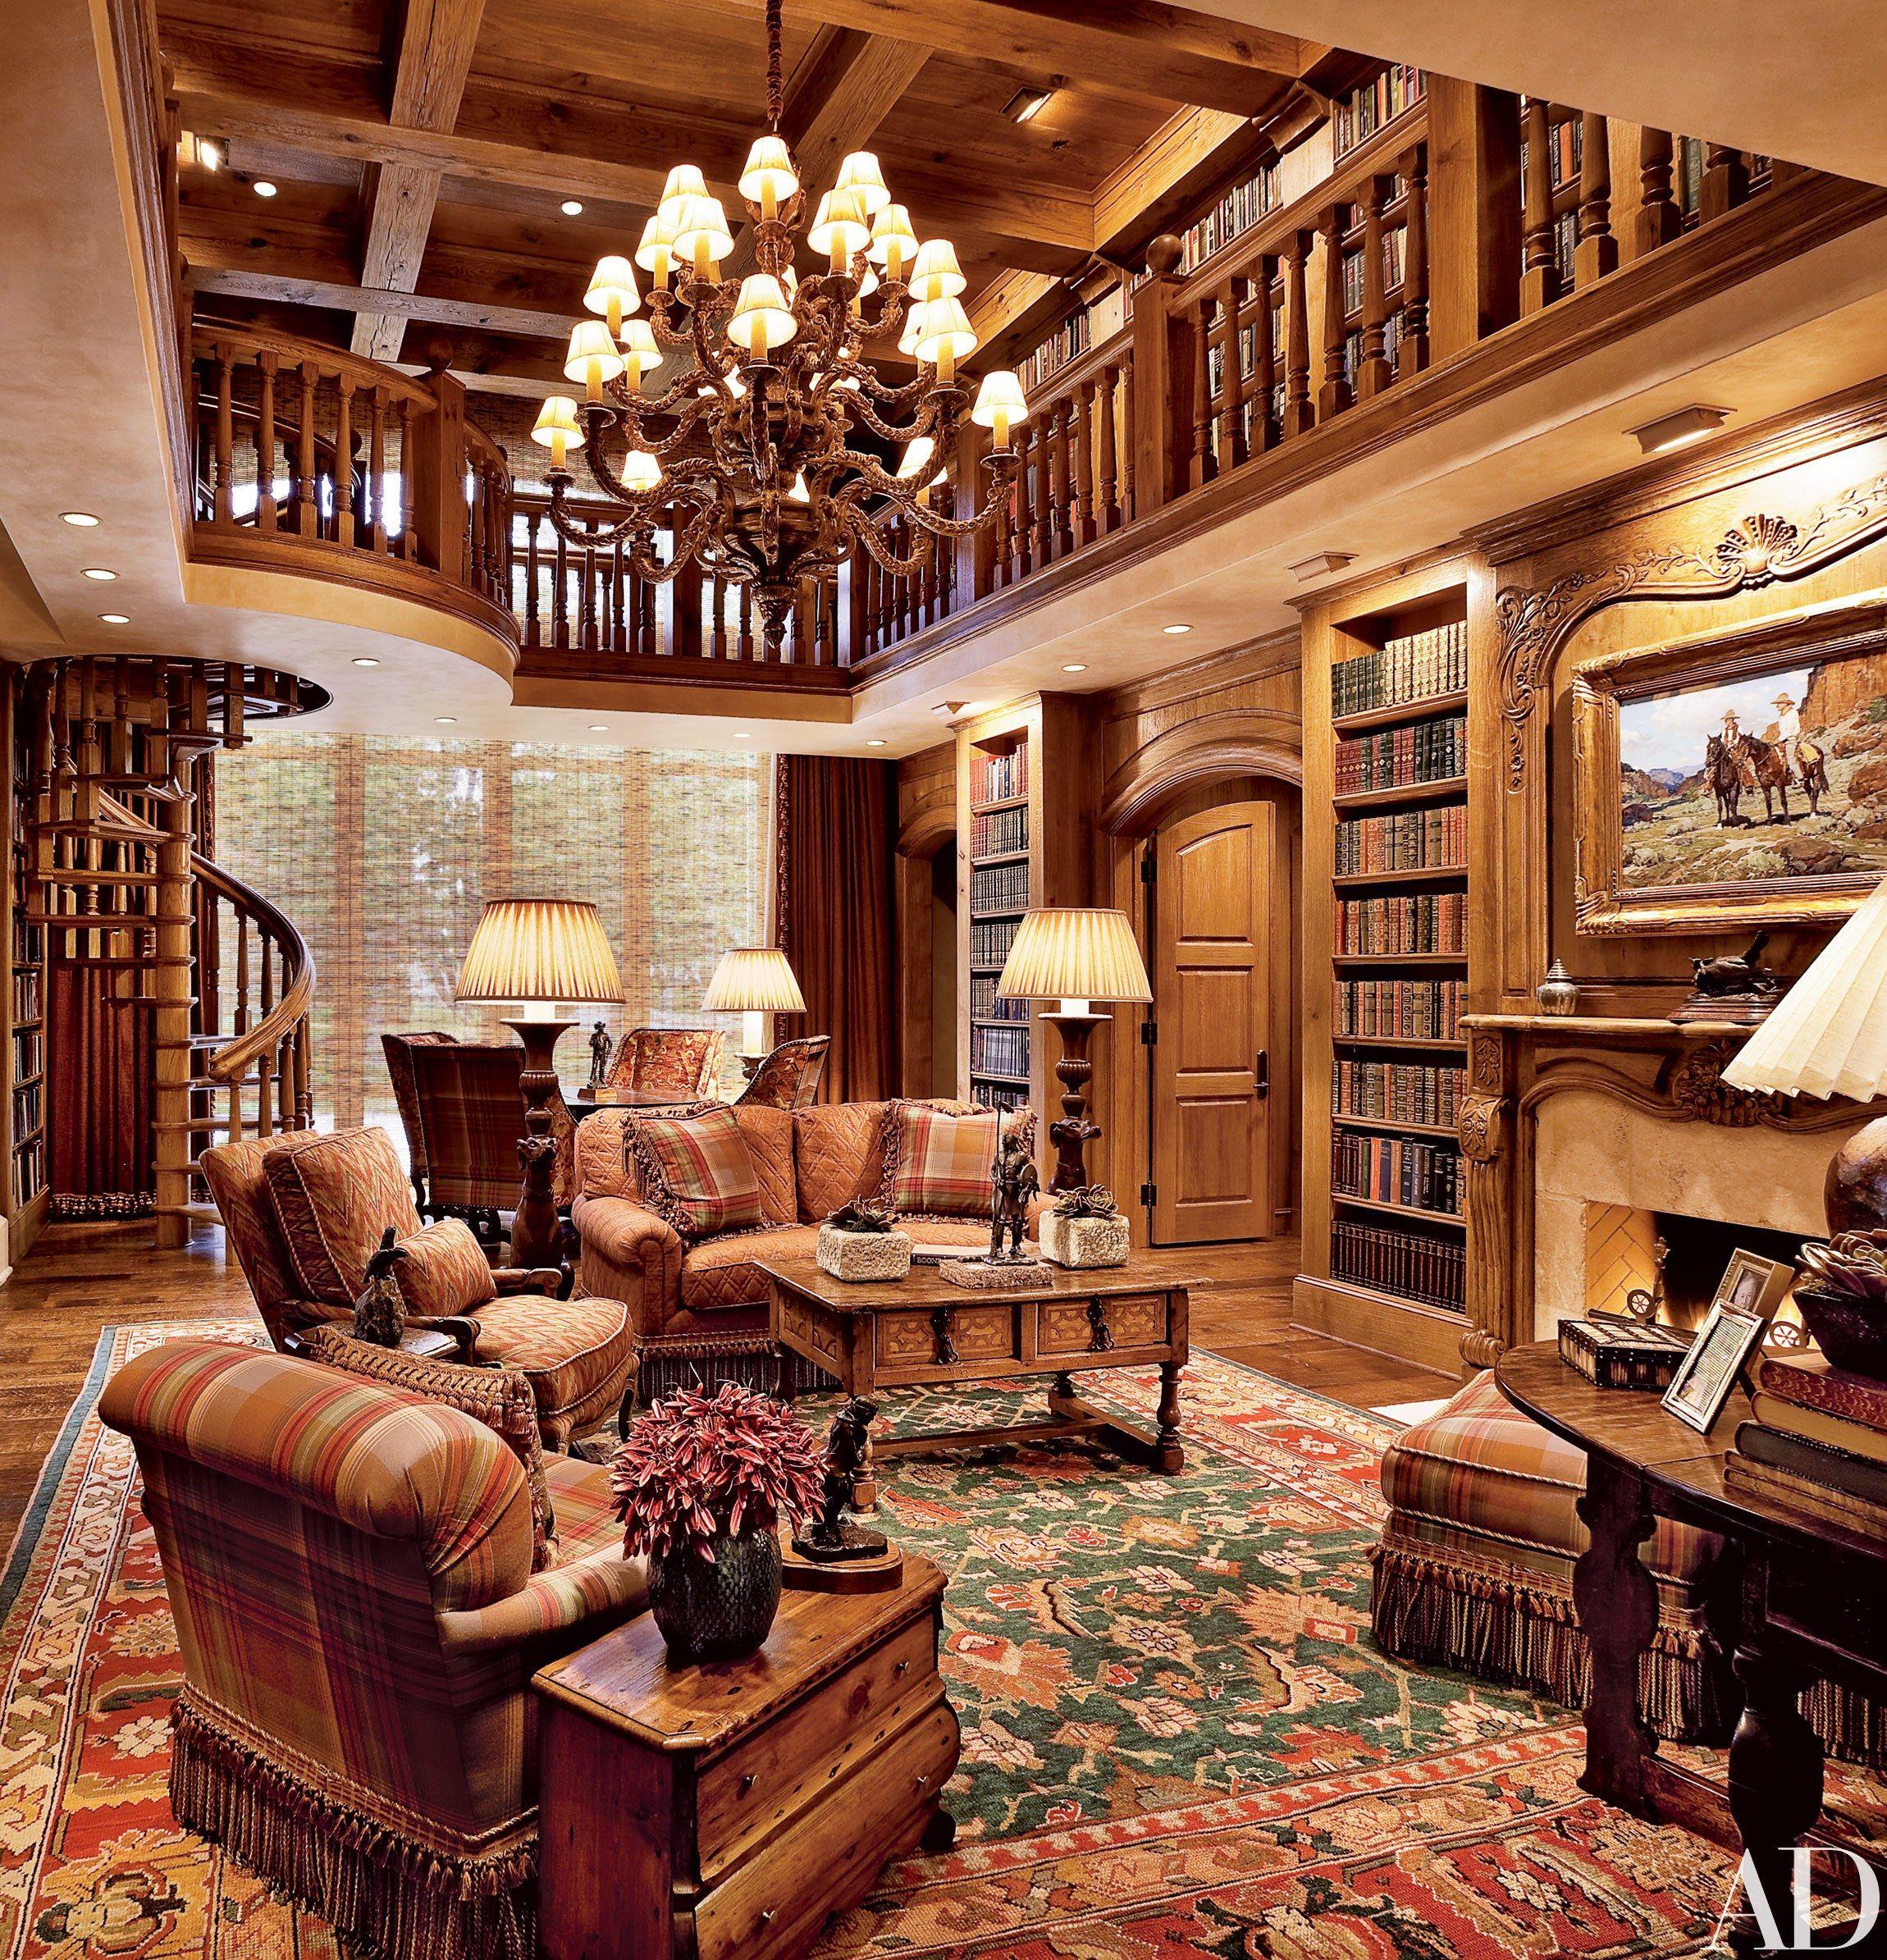 Cozy Home Libraries: T. Boone Pickens's Mesa Vista Ranch In Texas